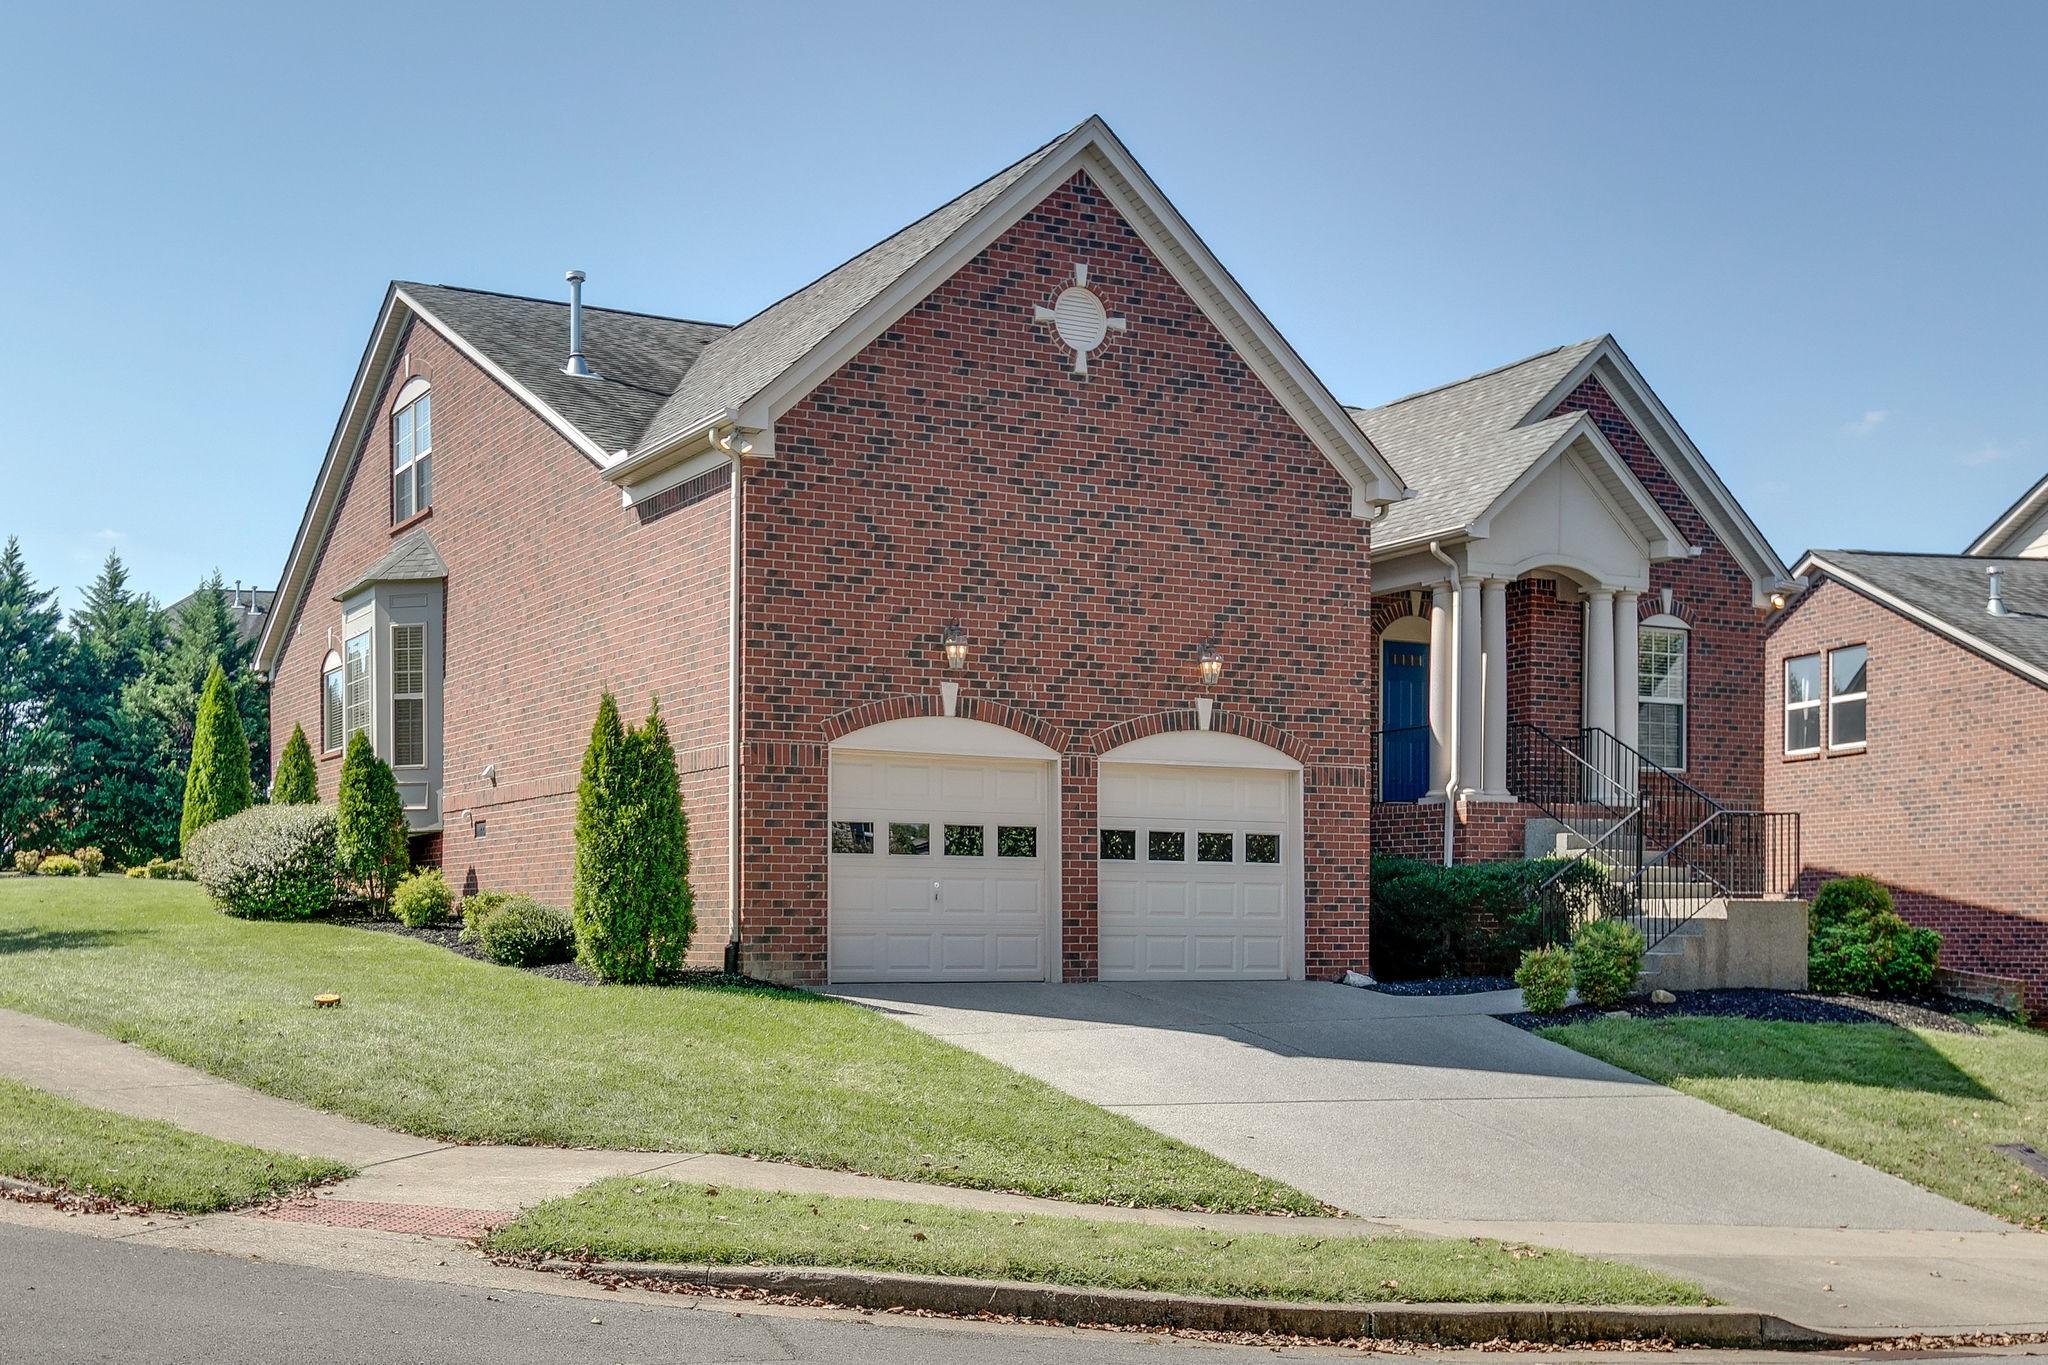 8956 Macauley Ln, Nolensville, TN 37135 - Nolensville, TN real estate listing